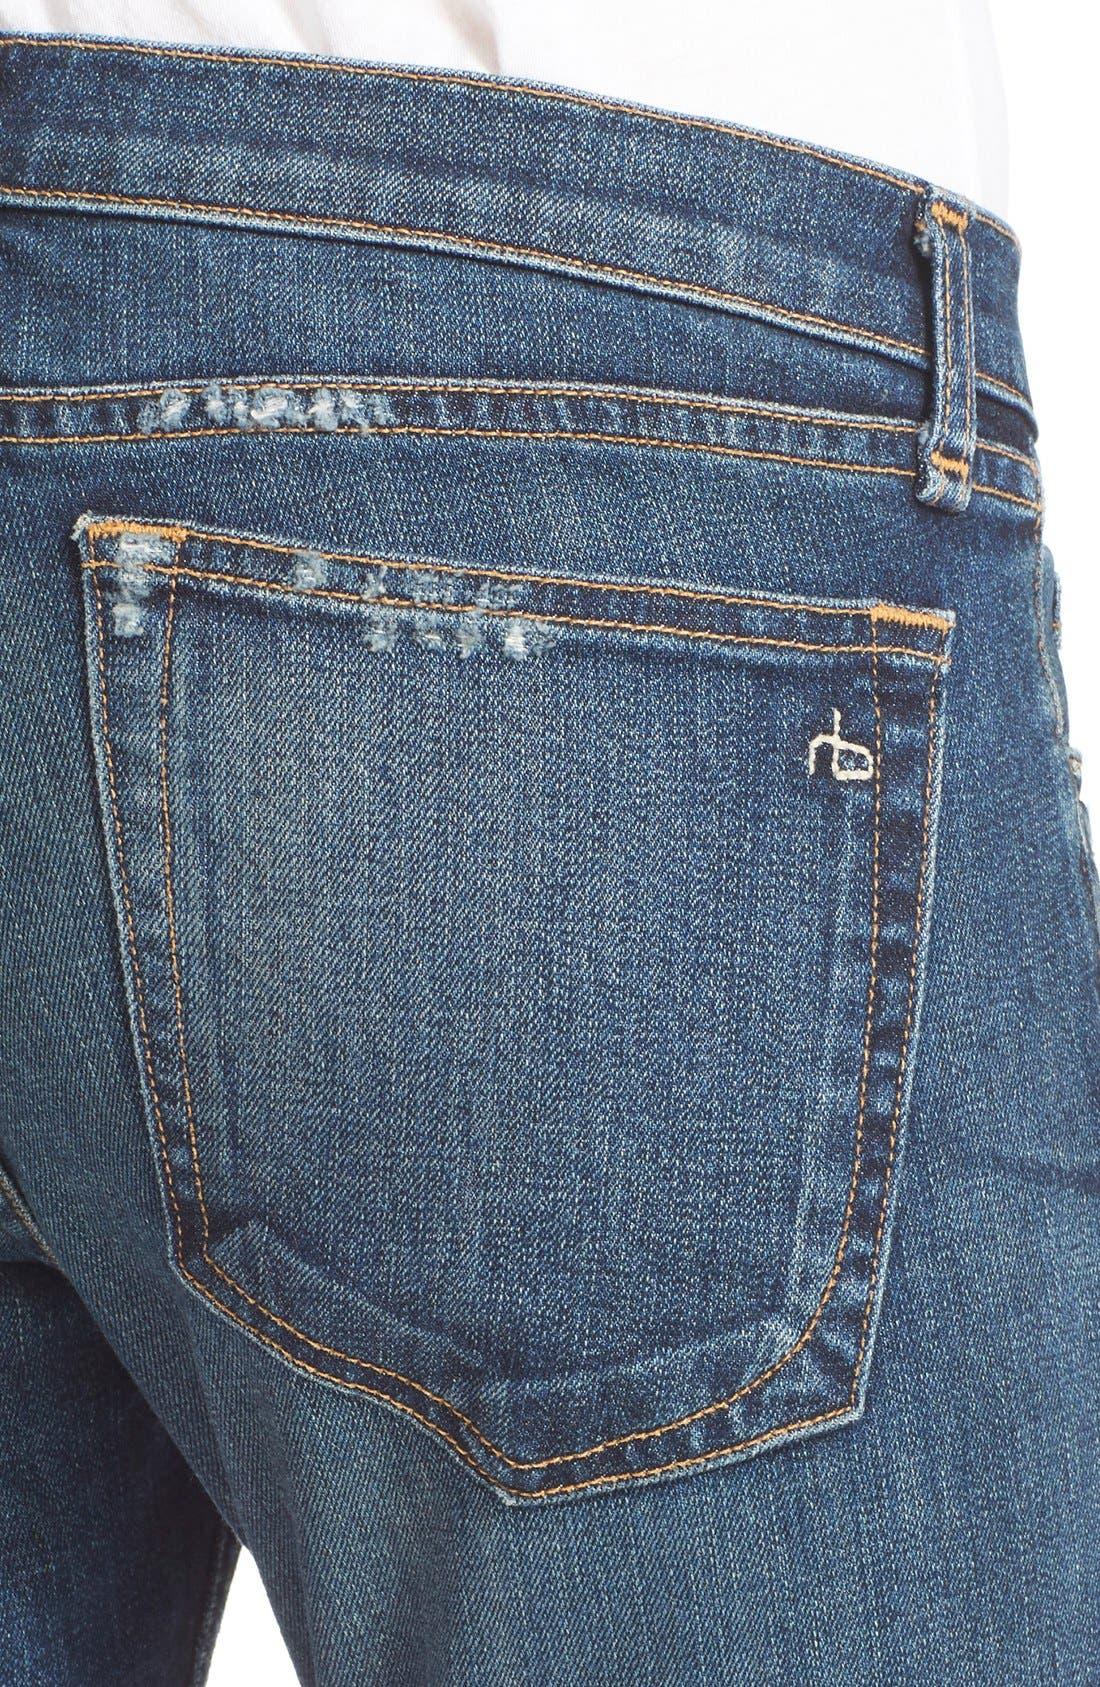 Alternate Image 4  - rag & bone/JEAN 'The Dre' Slim Fit Boyfriend Jeans (Mabel)